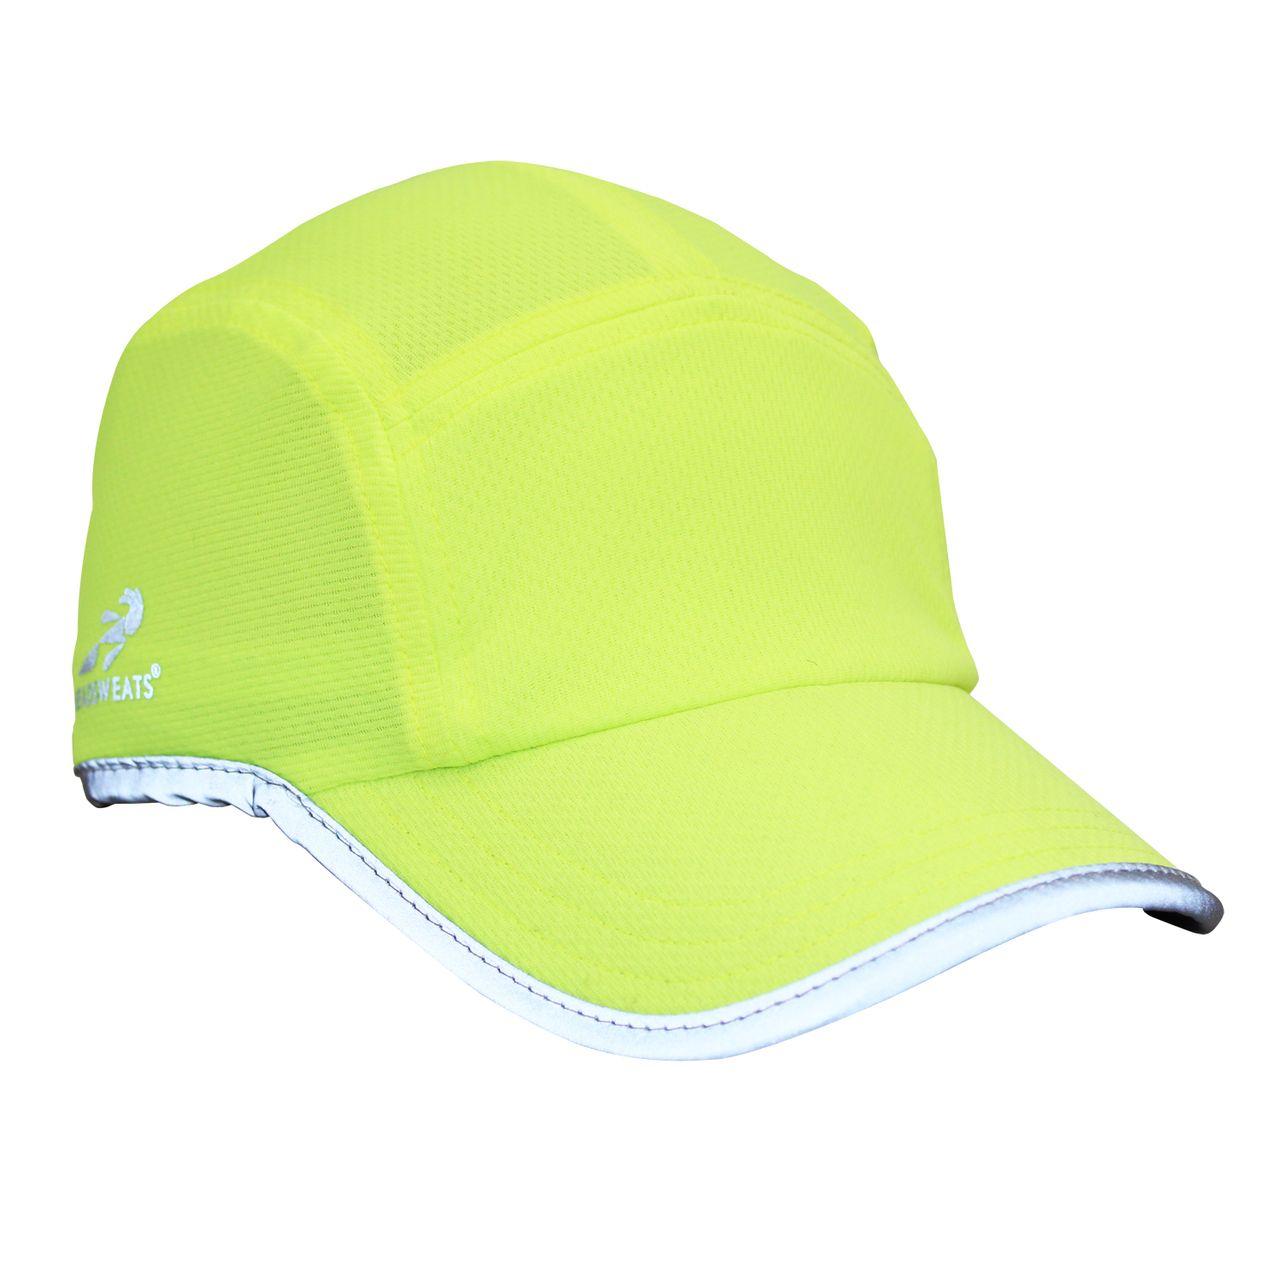 Headsweats - Race Hat - Hi Vis Yellow w/ Reflective Piping, $22.00 (http://www.headsweats.com/race-hat-hi-vis-yellow-w-reflective-piping/)